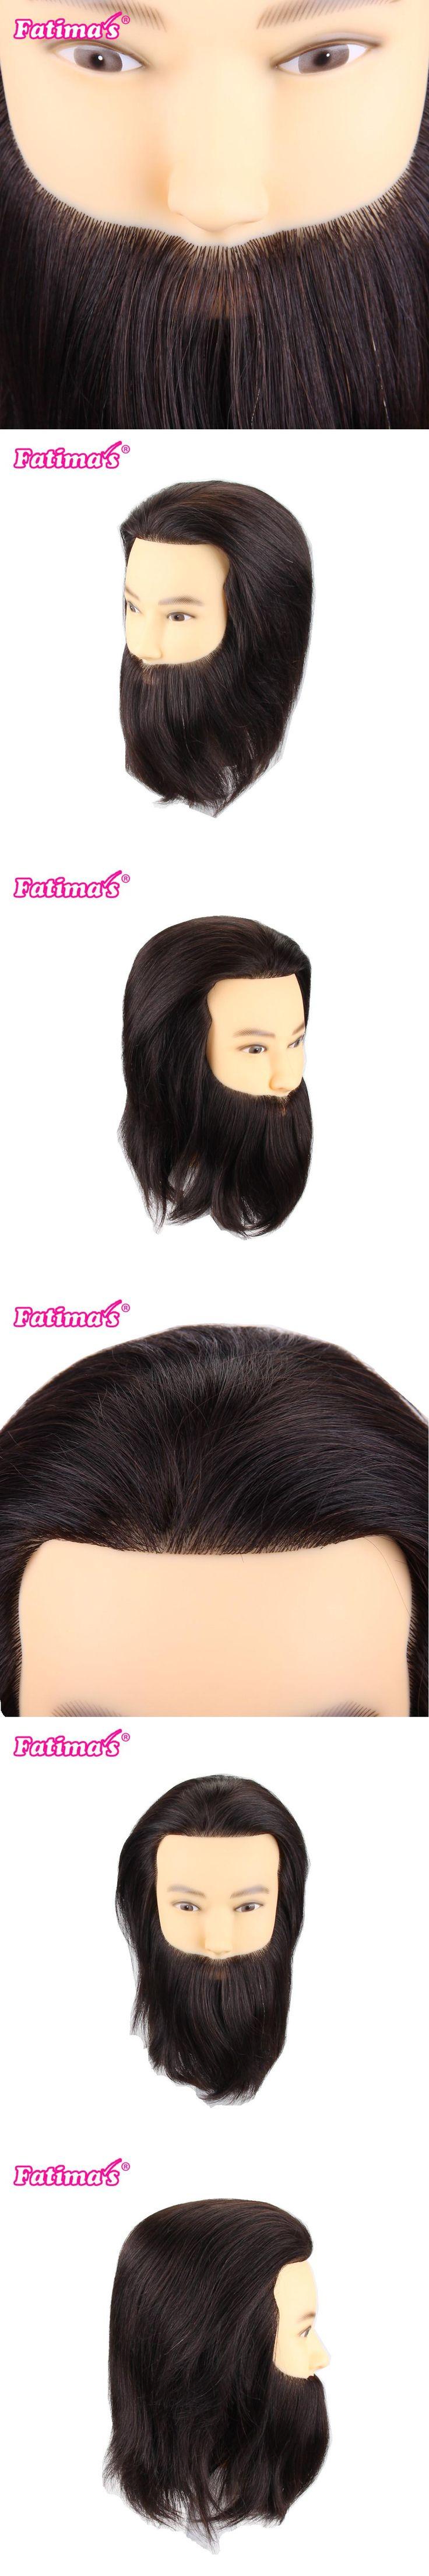 Fatimas 10 inch Male Mannequin Head 100% Hand Made Human Hair Hairdresser Training Head Manikin Cosmetology Doll Head